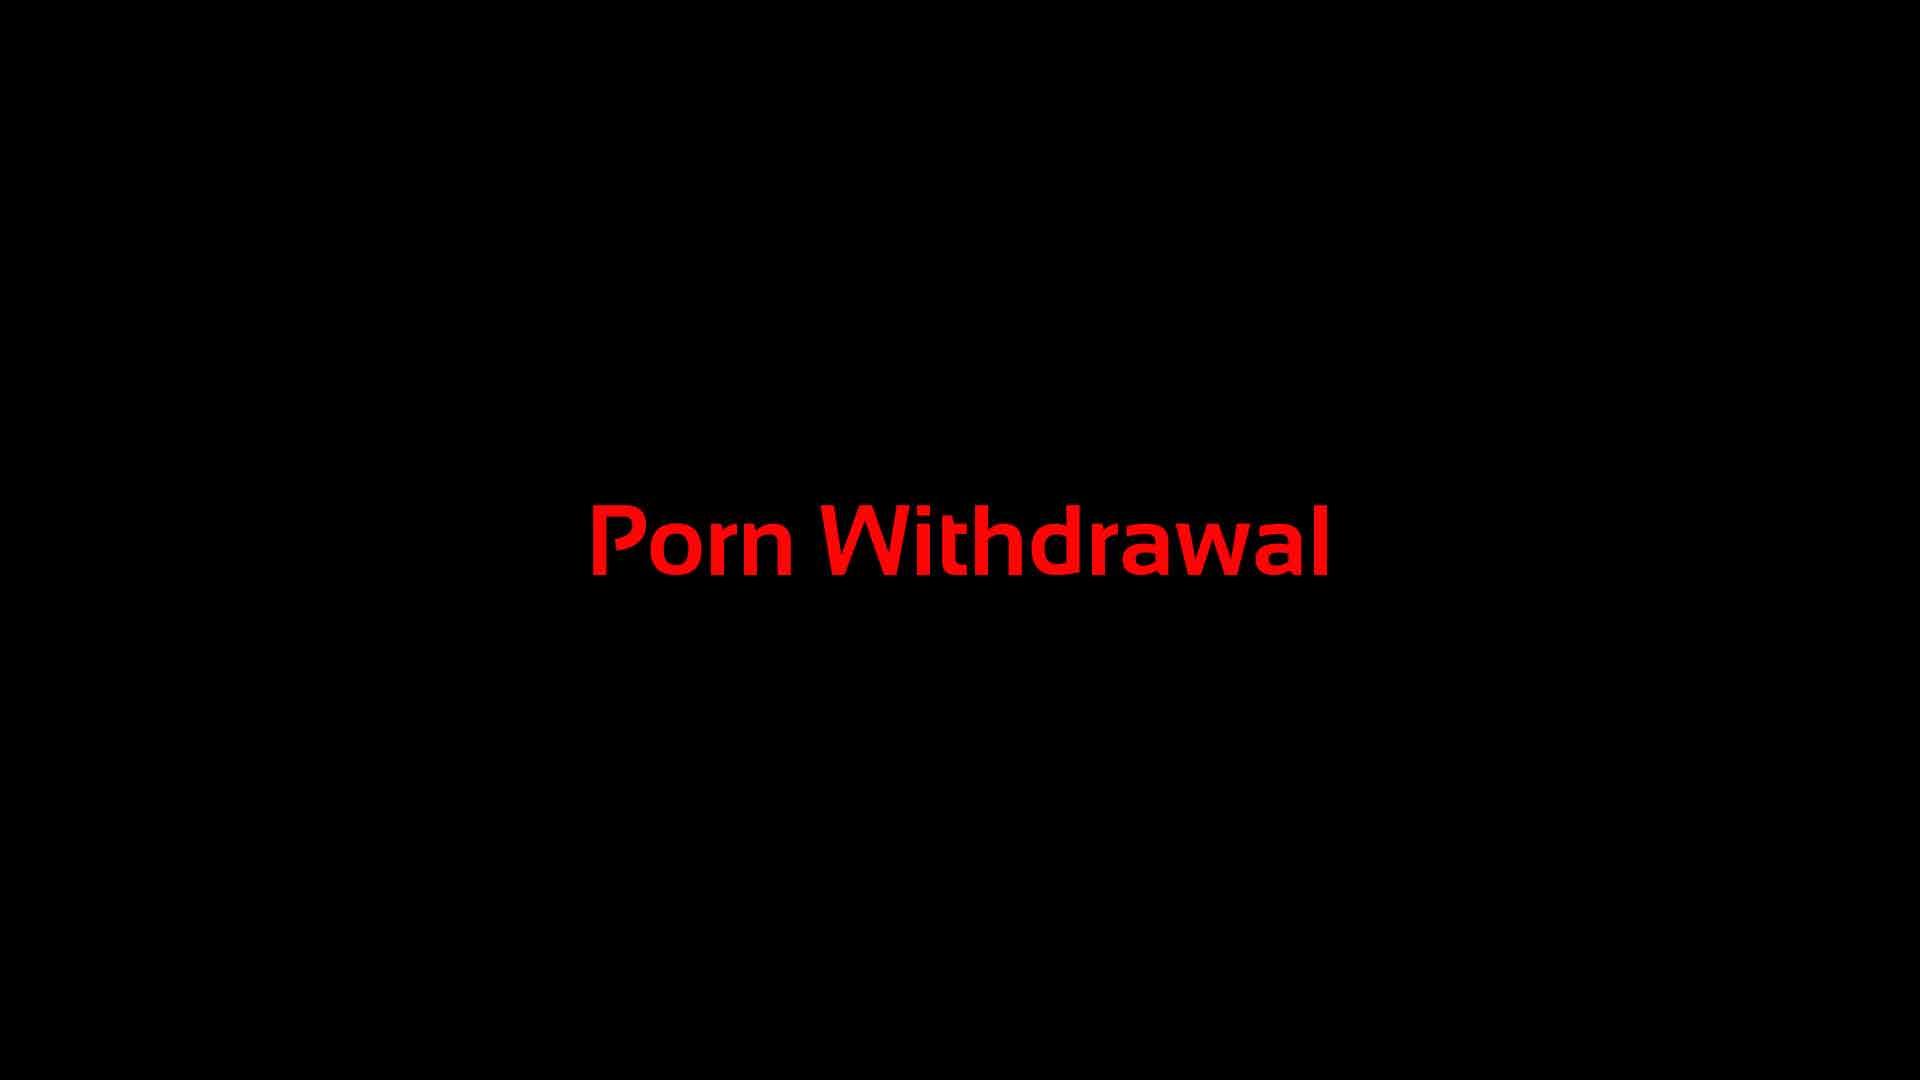 porn-withdrawal